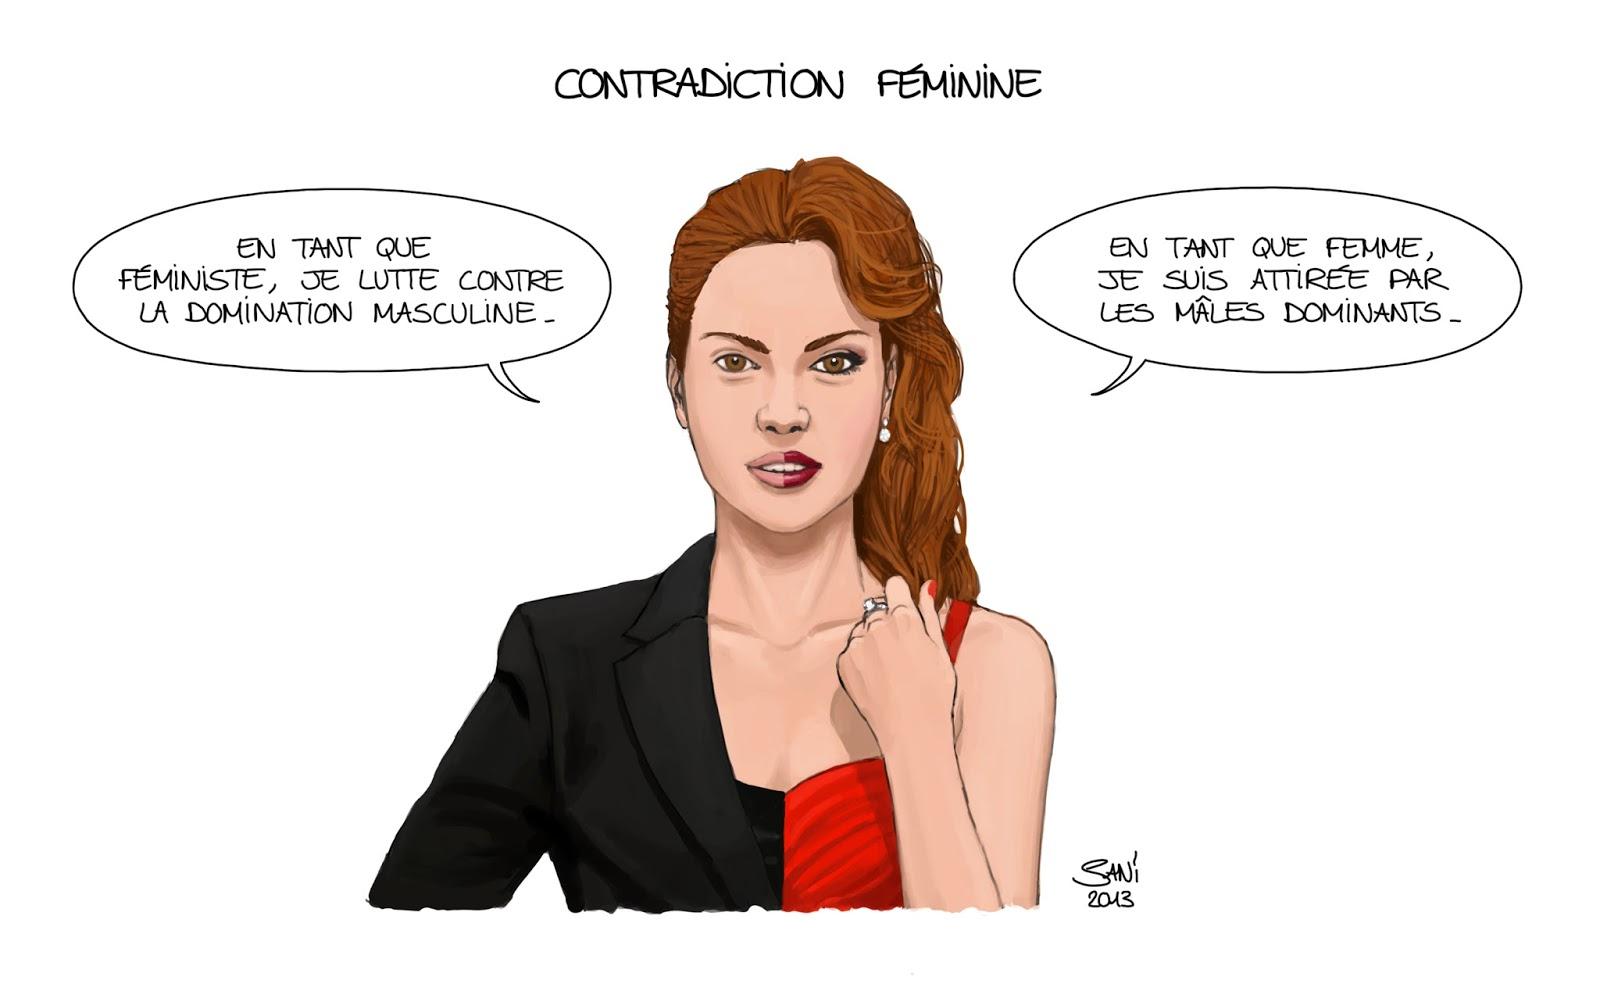 Favori SANI: Contradiction féminine DL03